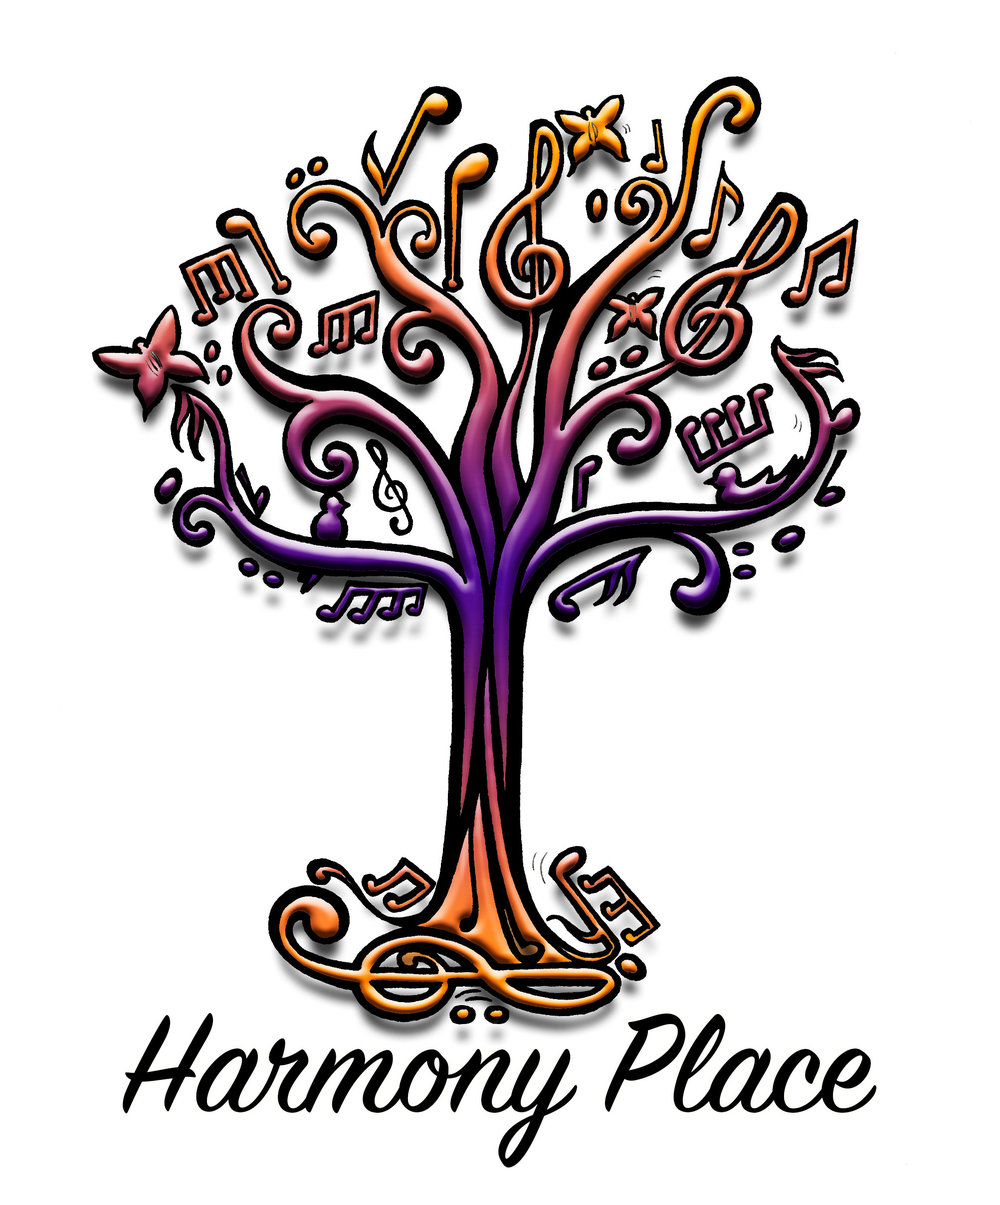 Harmony place.jpg